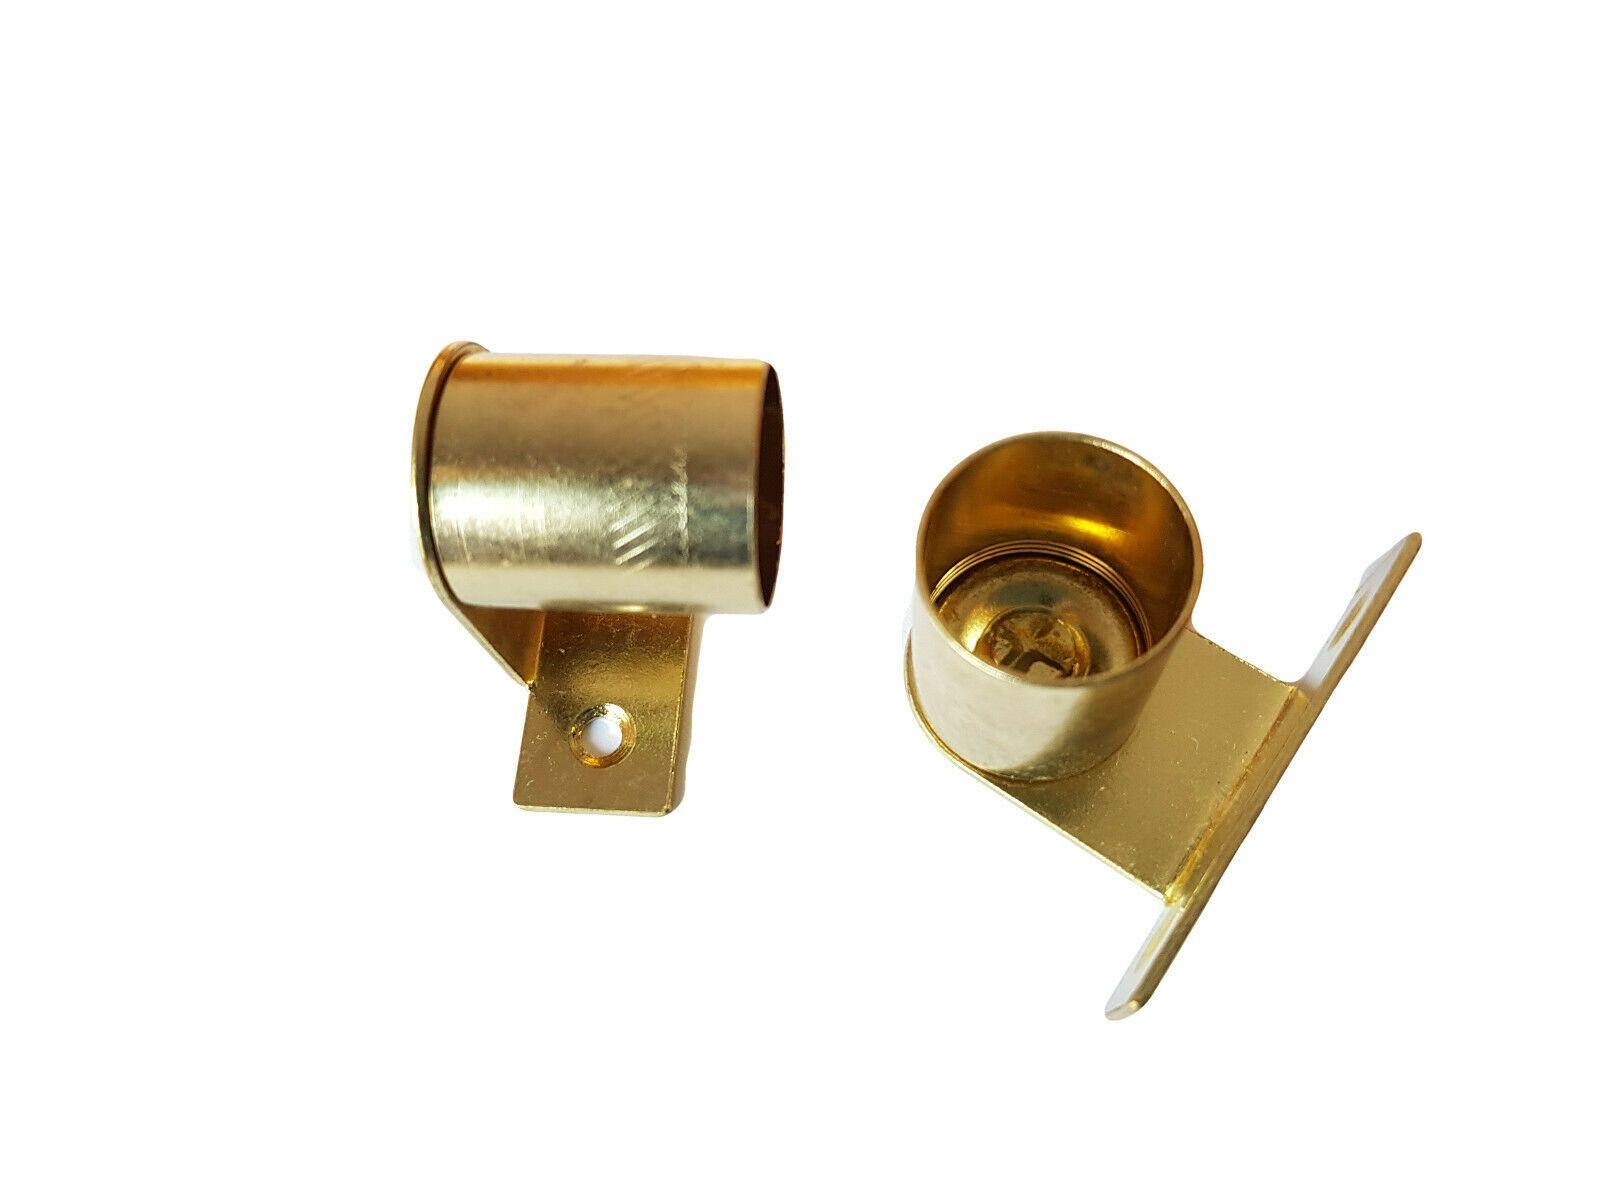 2 brass cranked curtain rod recess brackets 20mm pole support brackets net voile